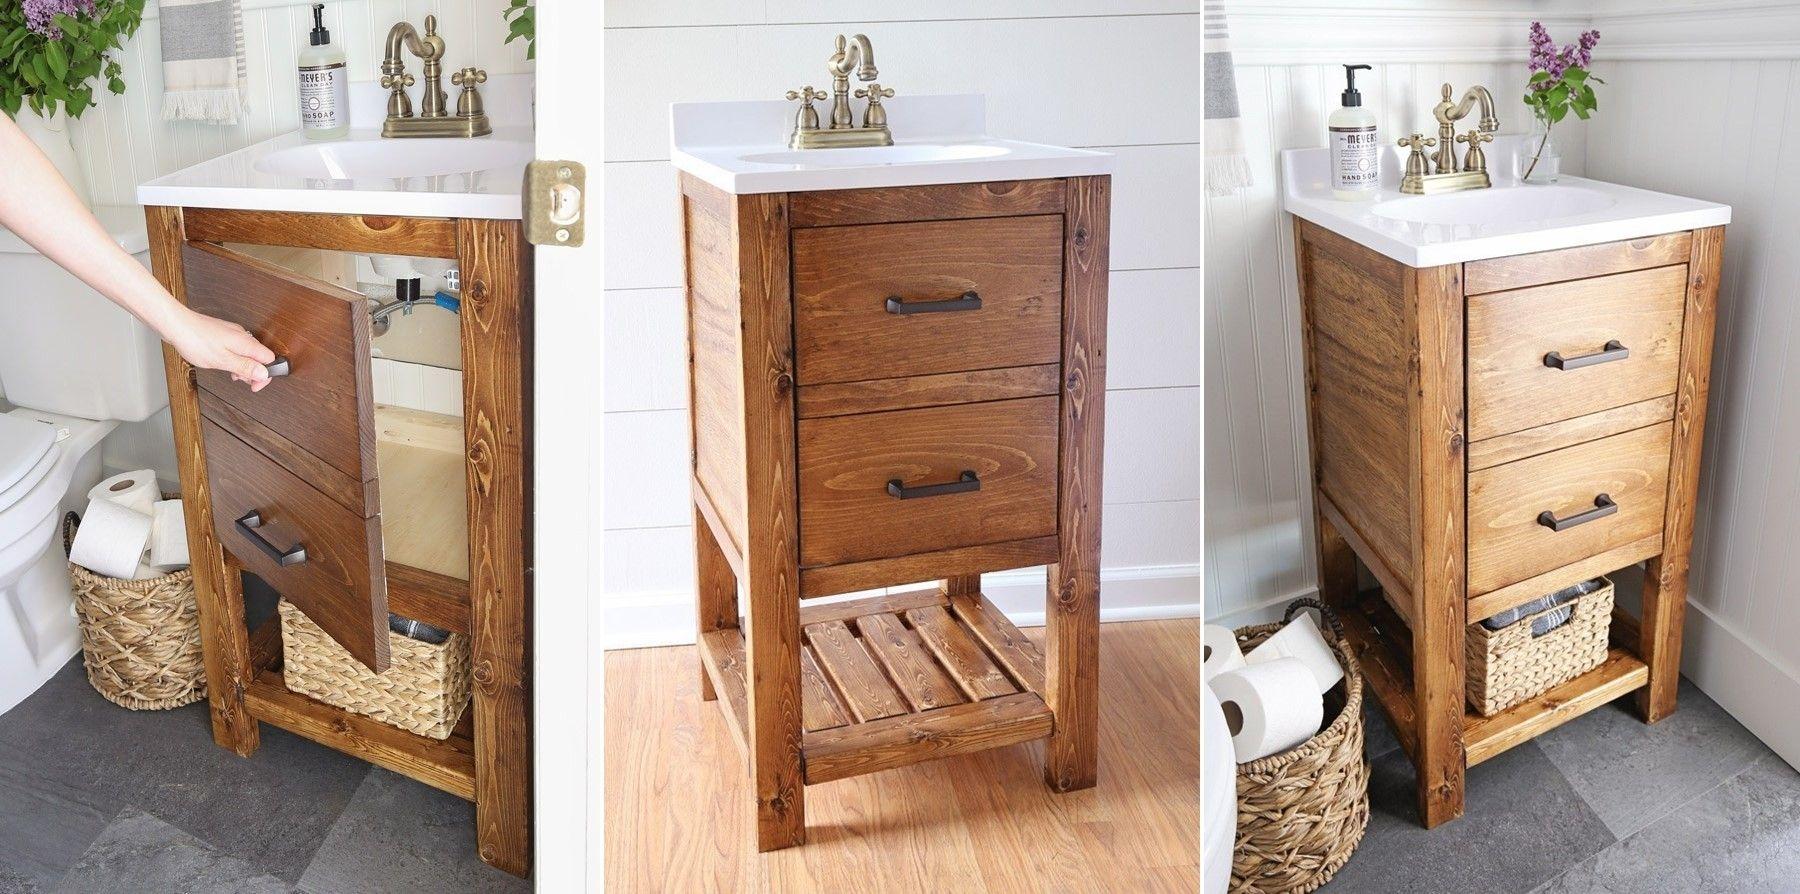 13 Amazing Small Bathroom Vanity Ideas You Can Try Easily Diy Bathroom Vanity Small Bathroom Vanities Diy Bathroom Small bathroom vanity ideas